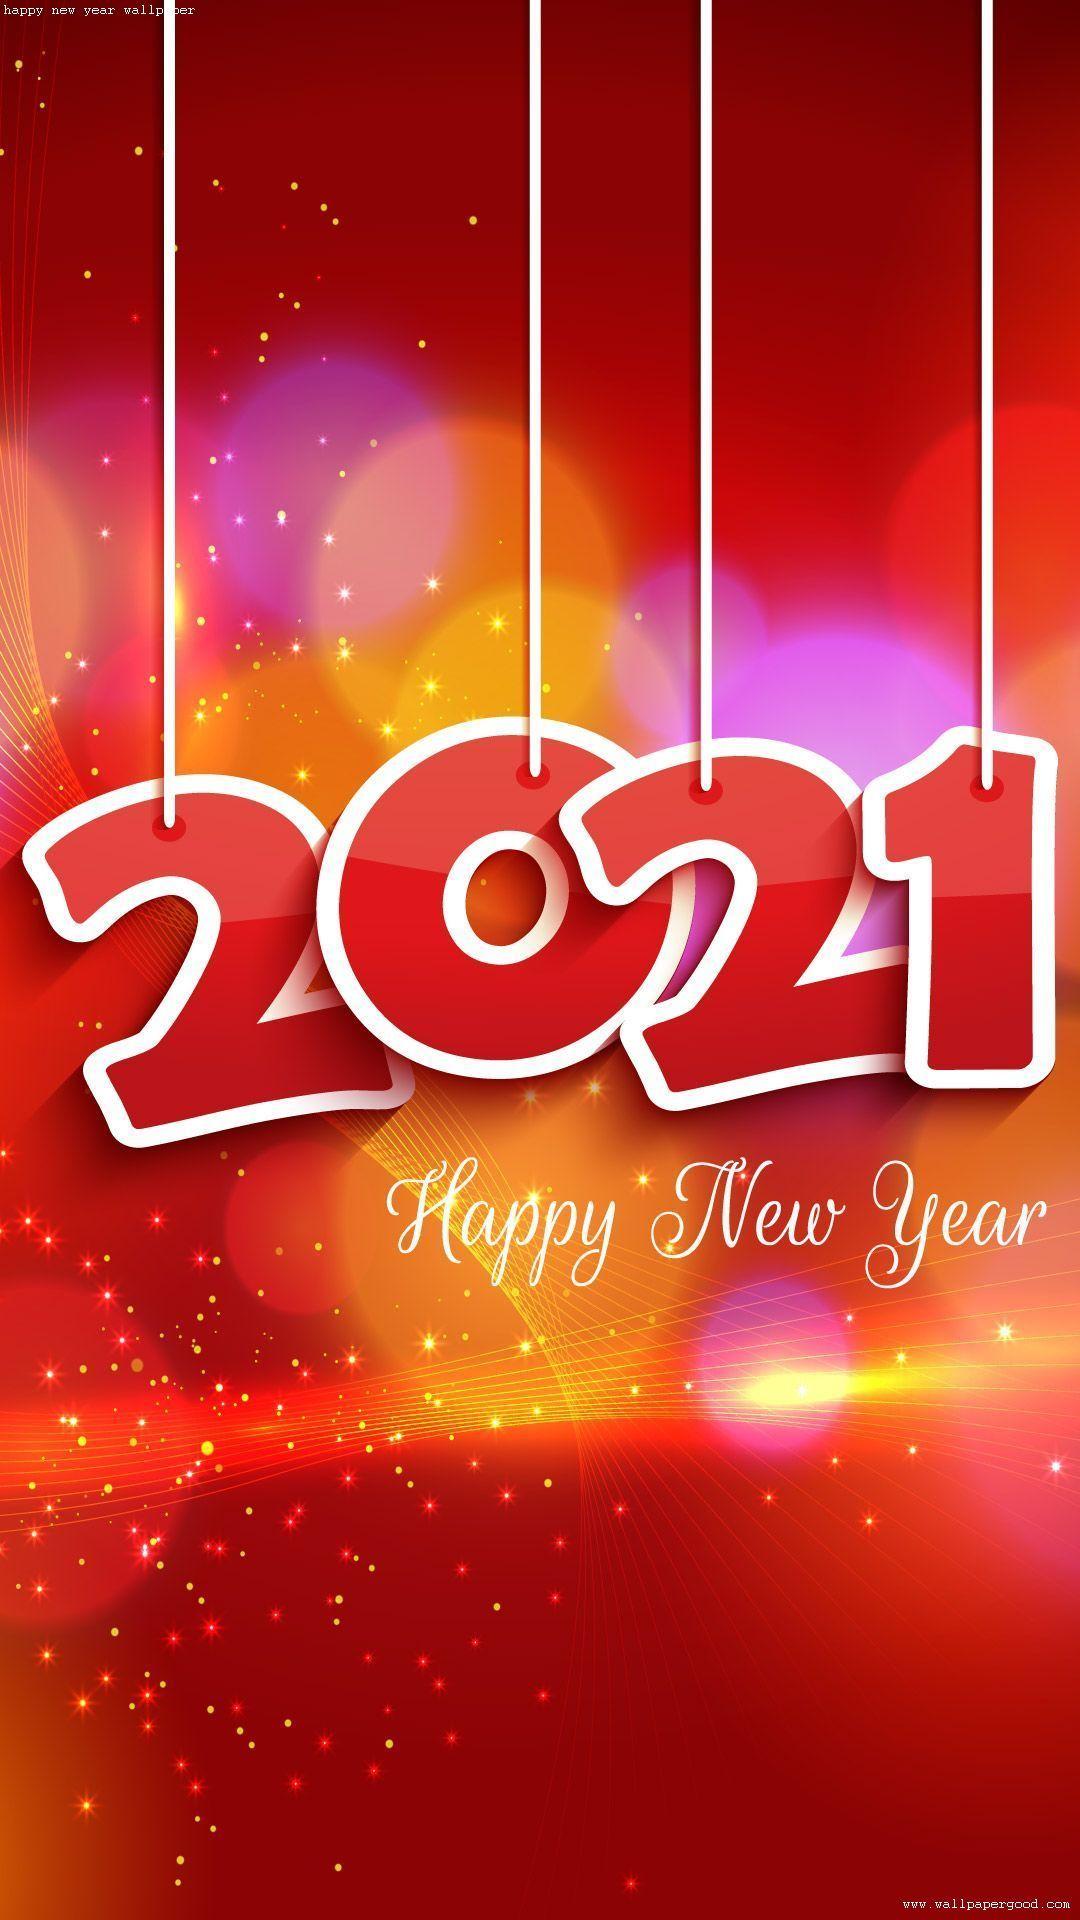 Happy New Year 2021 Wallpaper Download Happy New Year Images Happy New Year Background New Year Images New year 2021 orange hd background